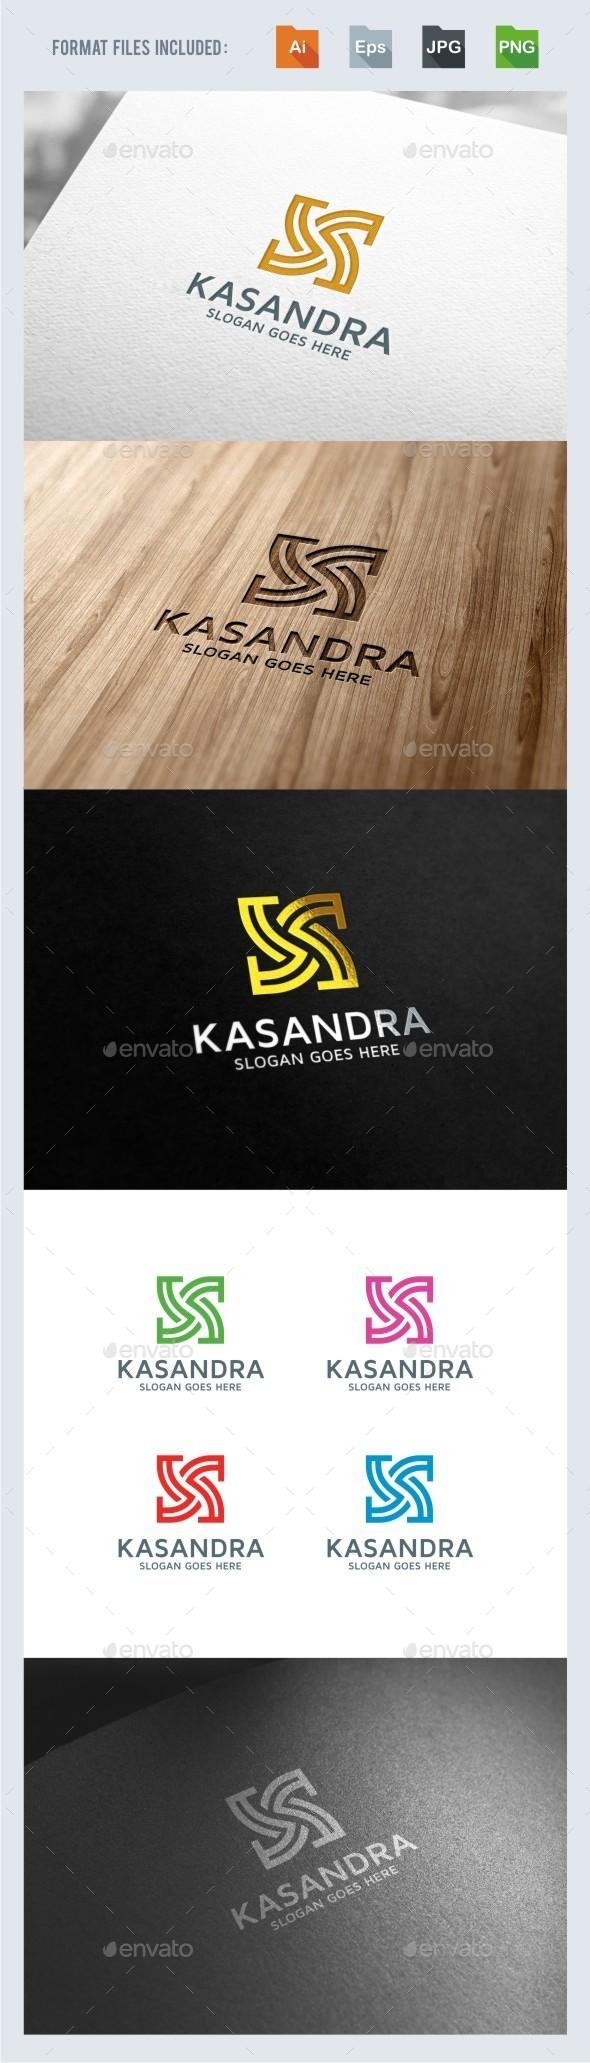 Kasandra - Abstract K Letter Logo Template